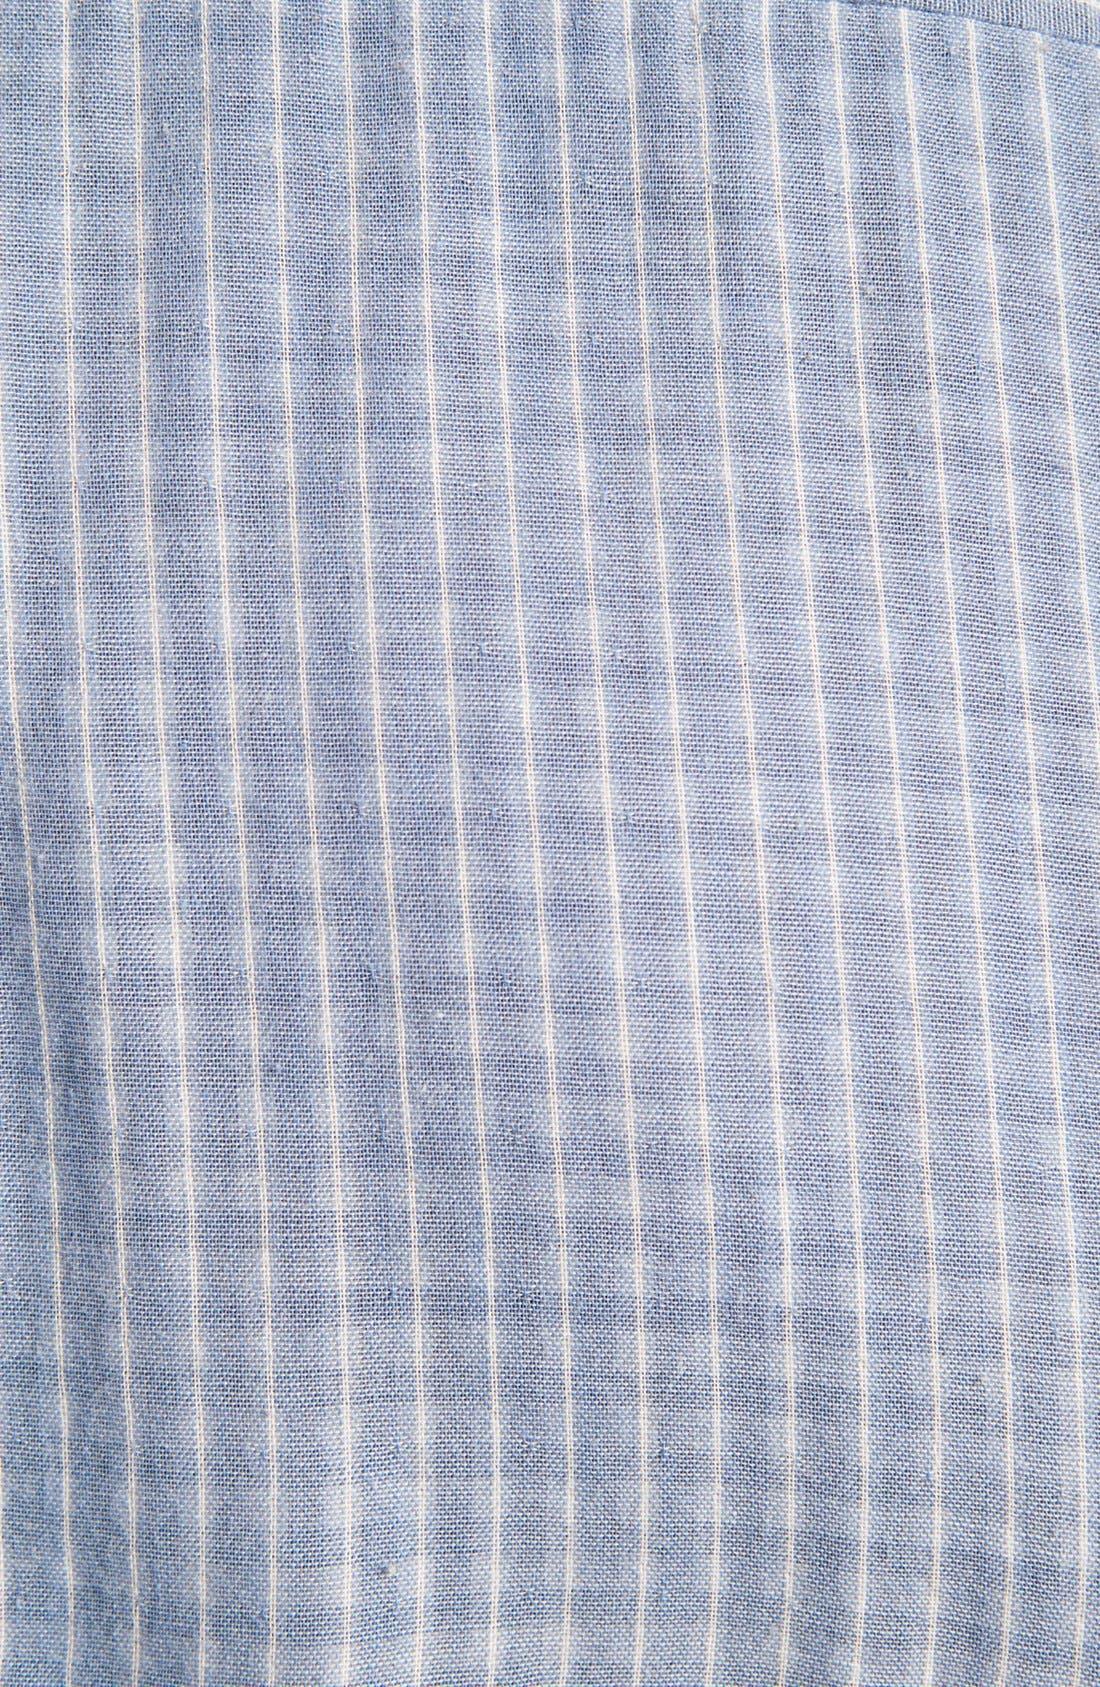 Alternate Image 3  - rag & bone 'Yokohama' Double Faced Cotton Shirt